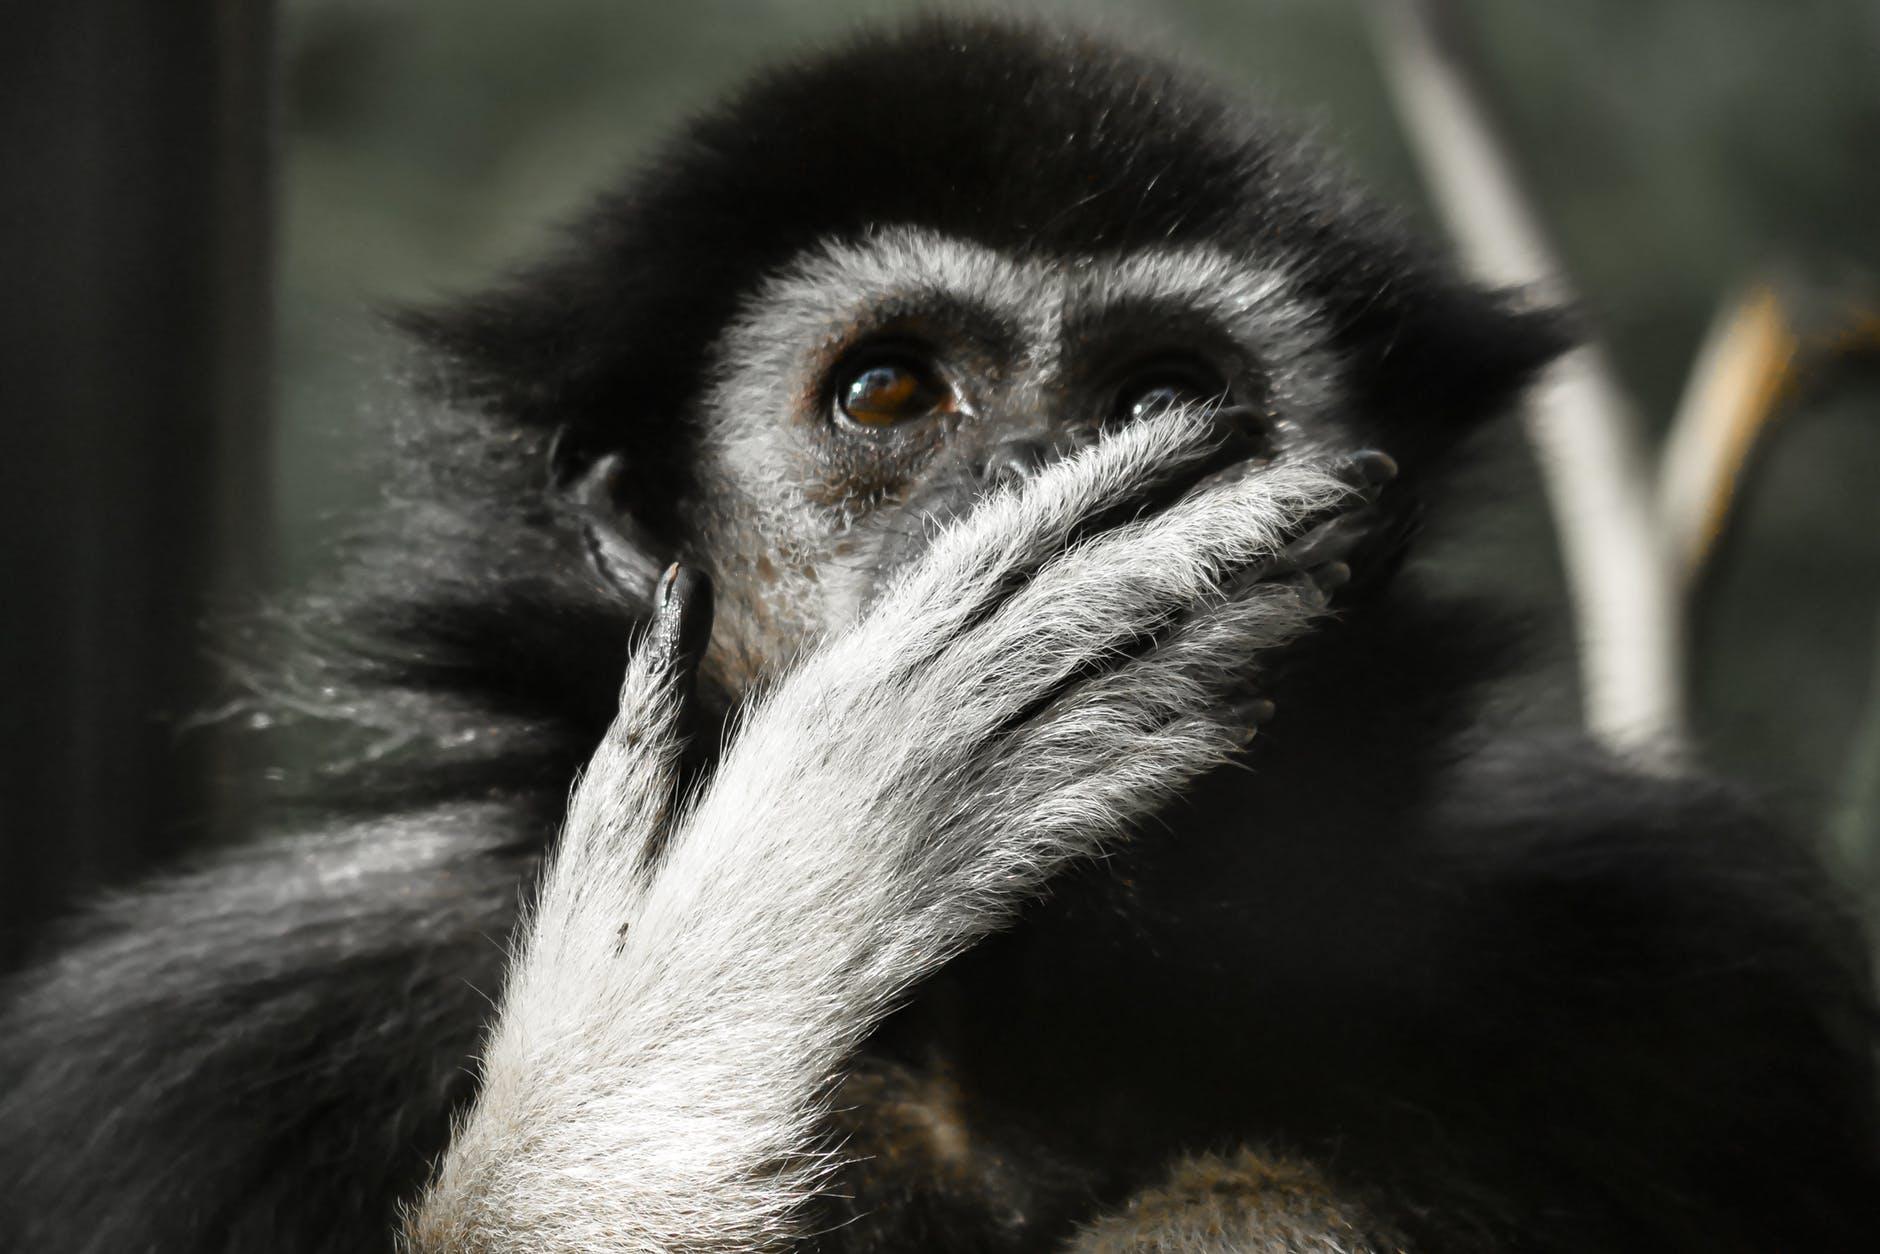 animal animal photography close up cute